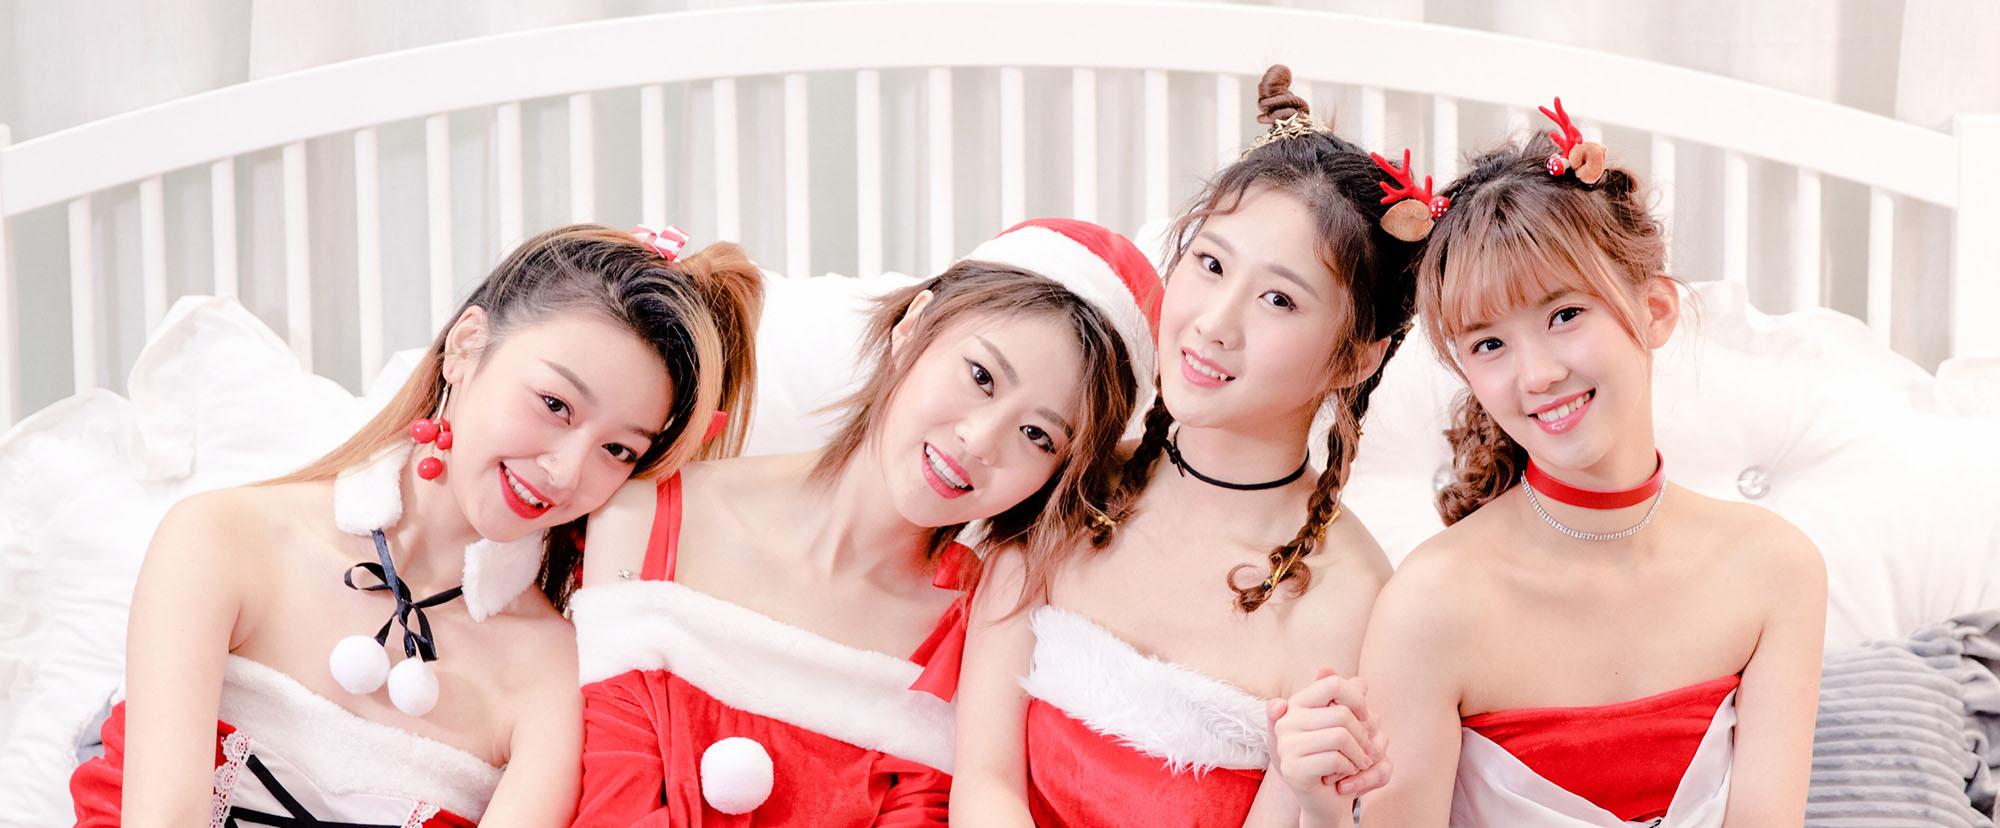 Twinkle女团单曲《星光许愿卡》及MV上线